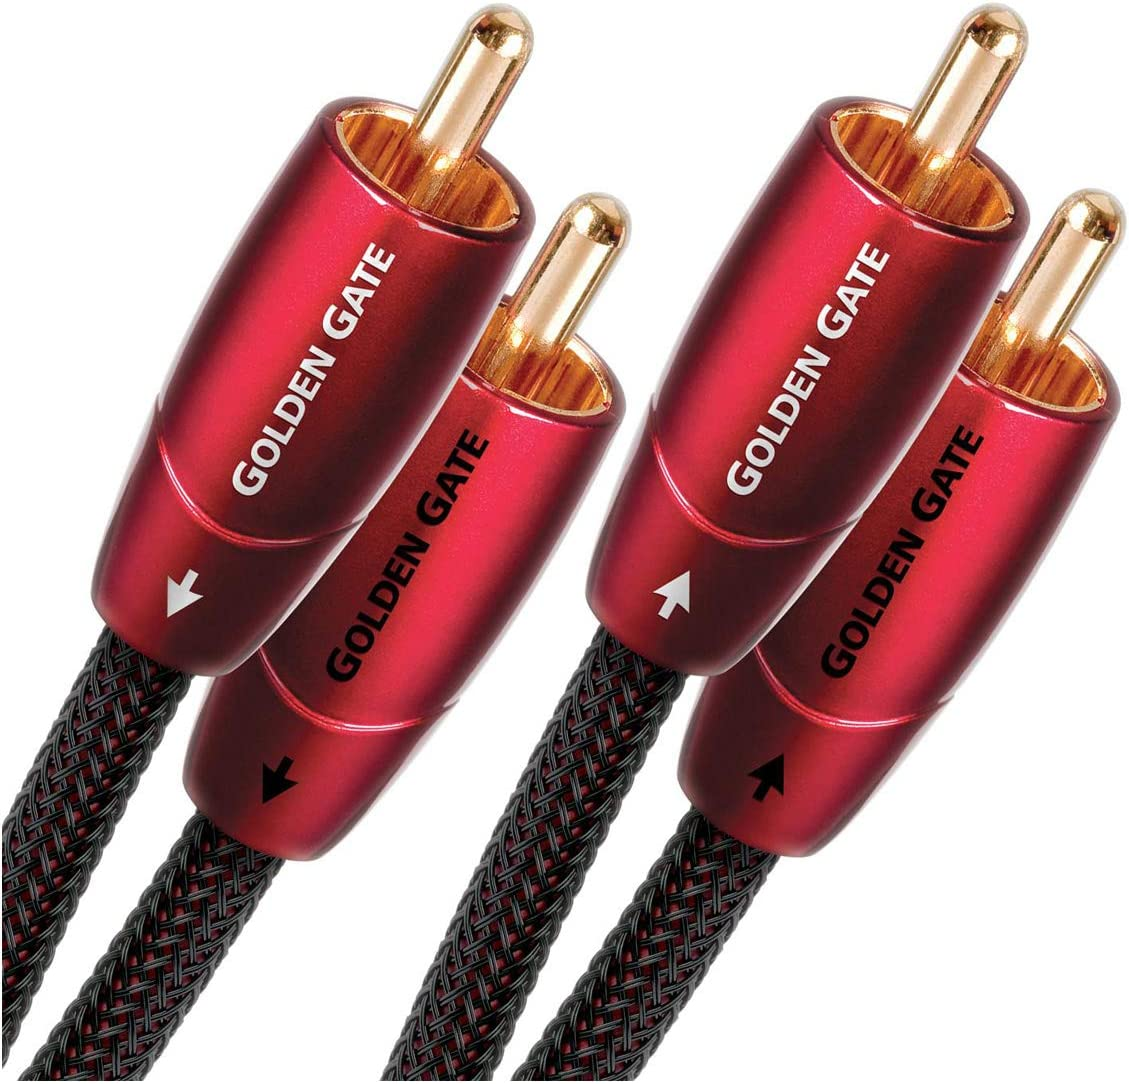 Audioquest Golden Gate Audiokabel Länge 3 0 M Elektronik